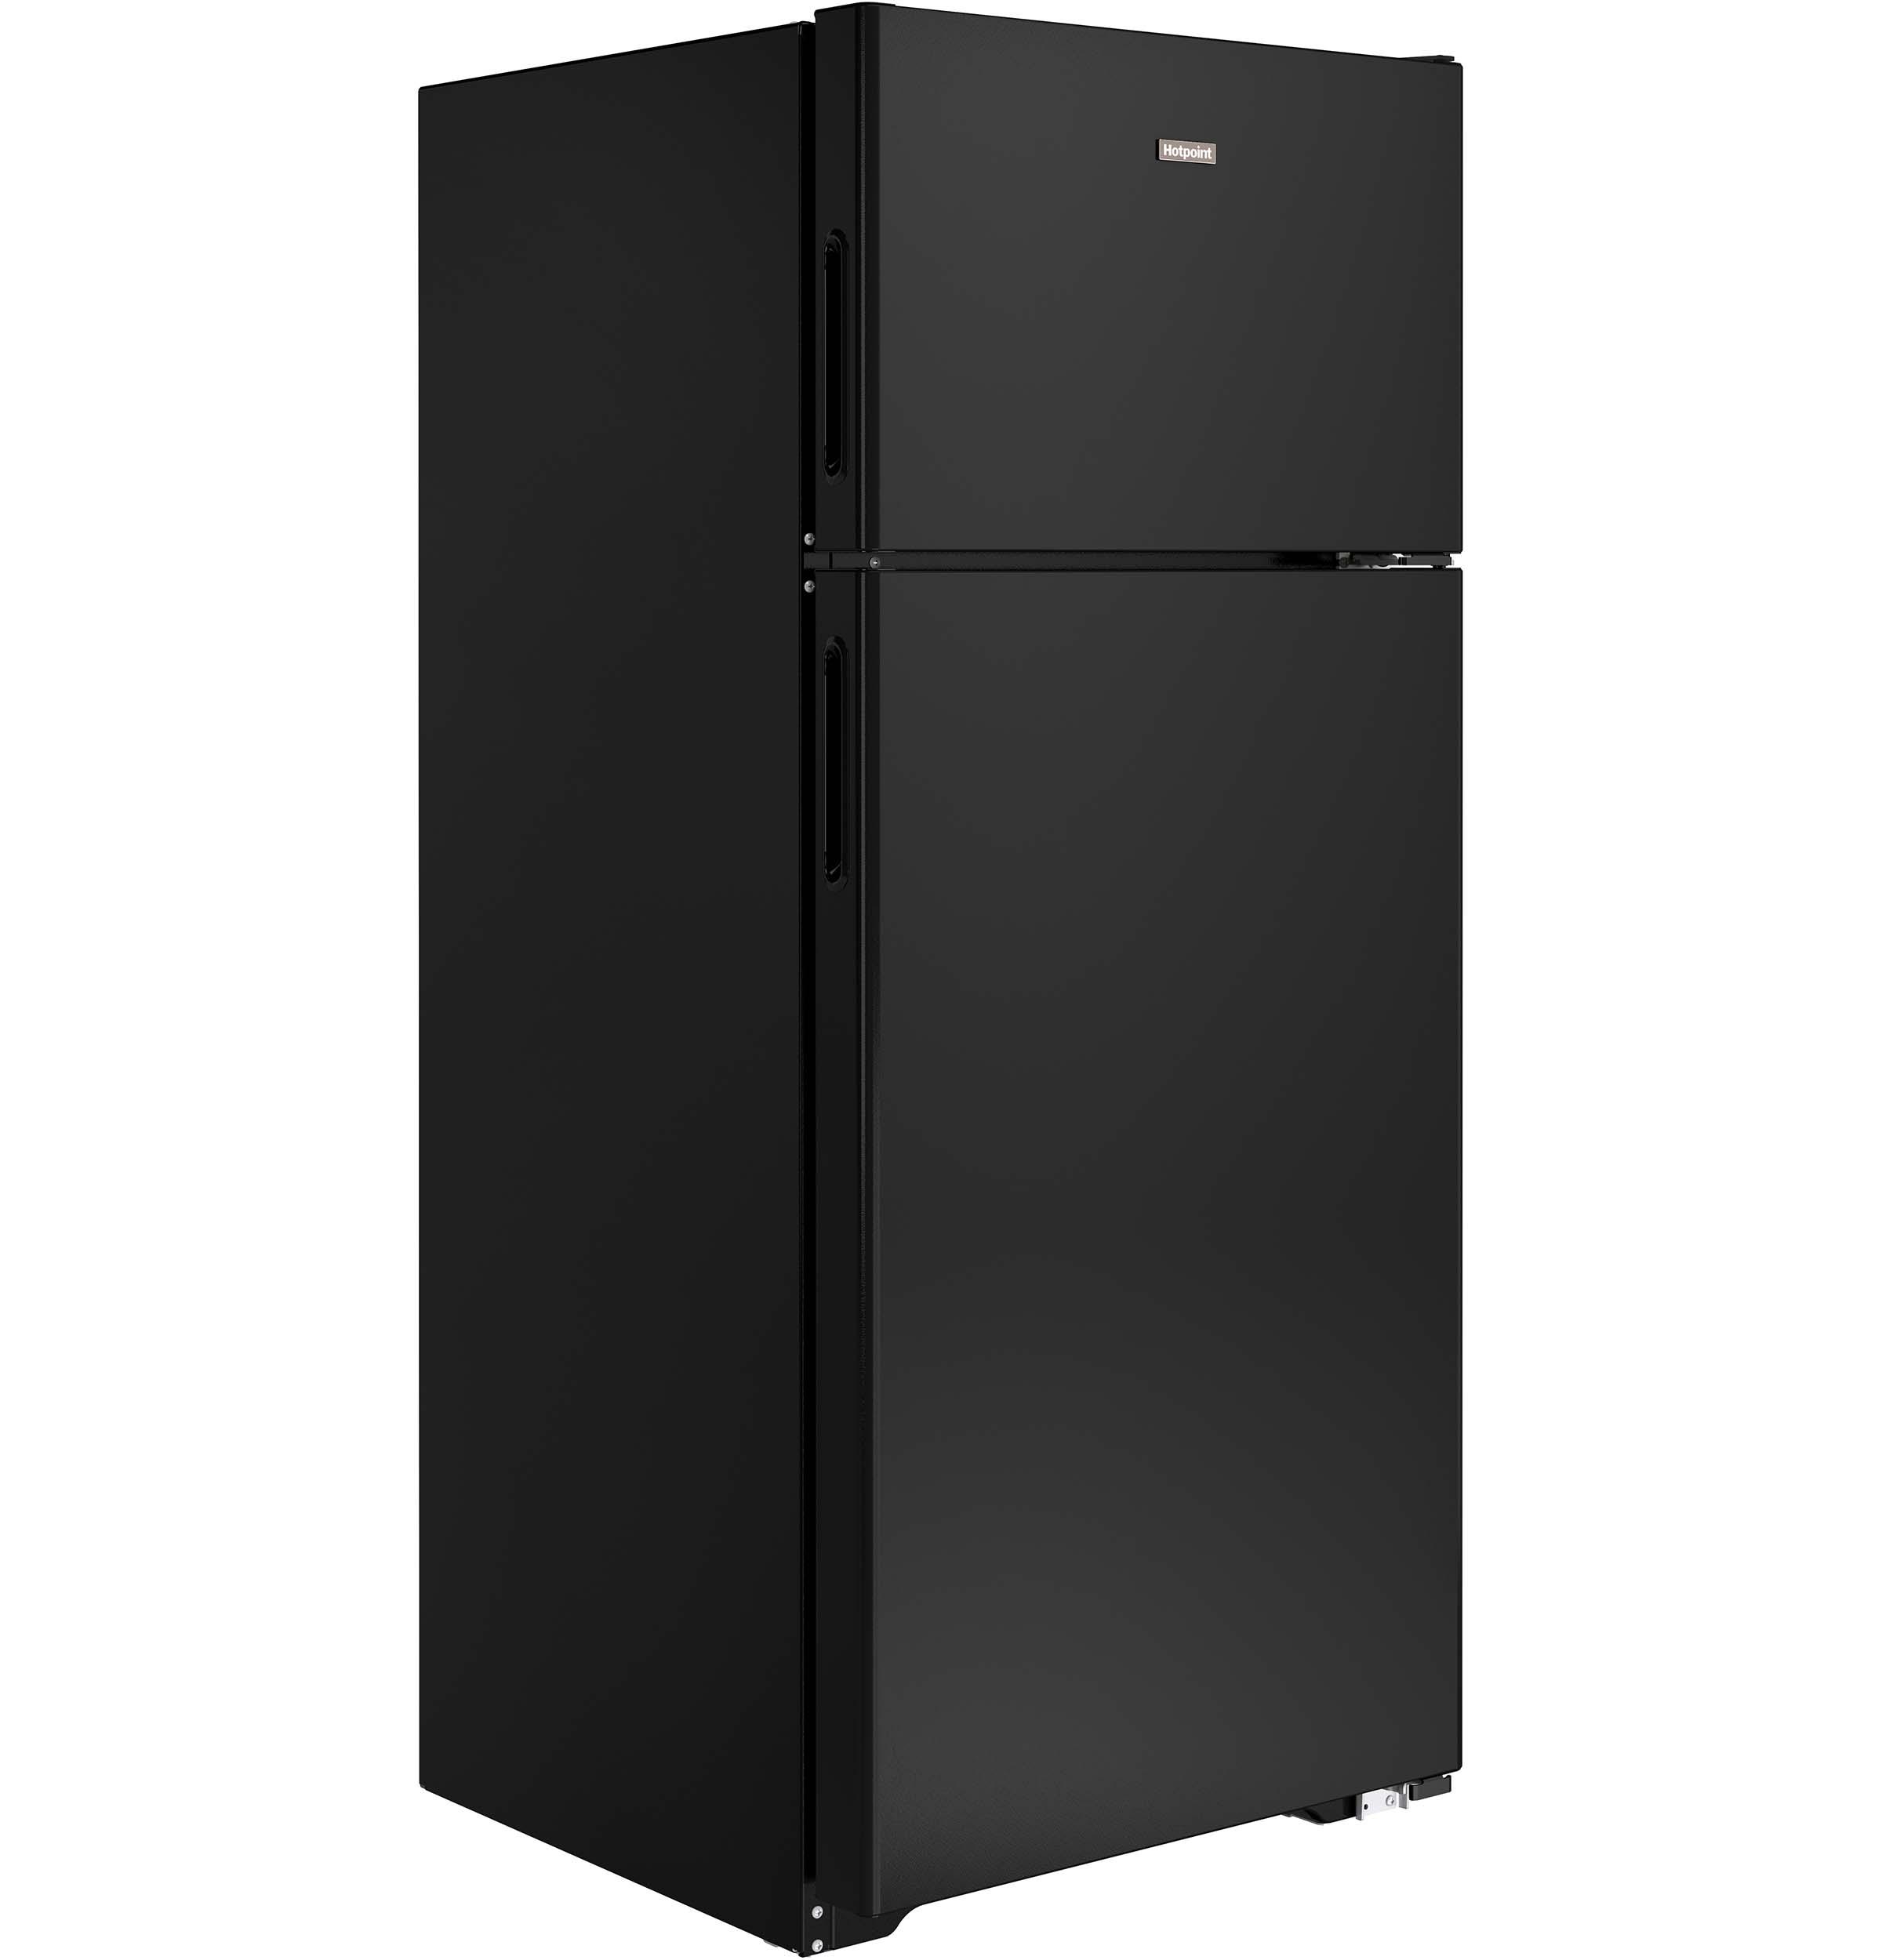 Model: HPS18BTHBB | Hotpoint® 17.5 Cu. Ft. Top-Freezer Refrigerator